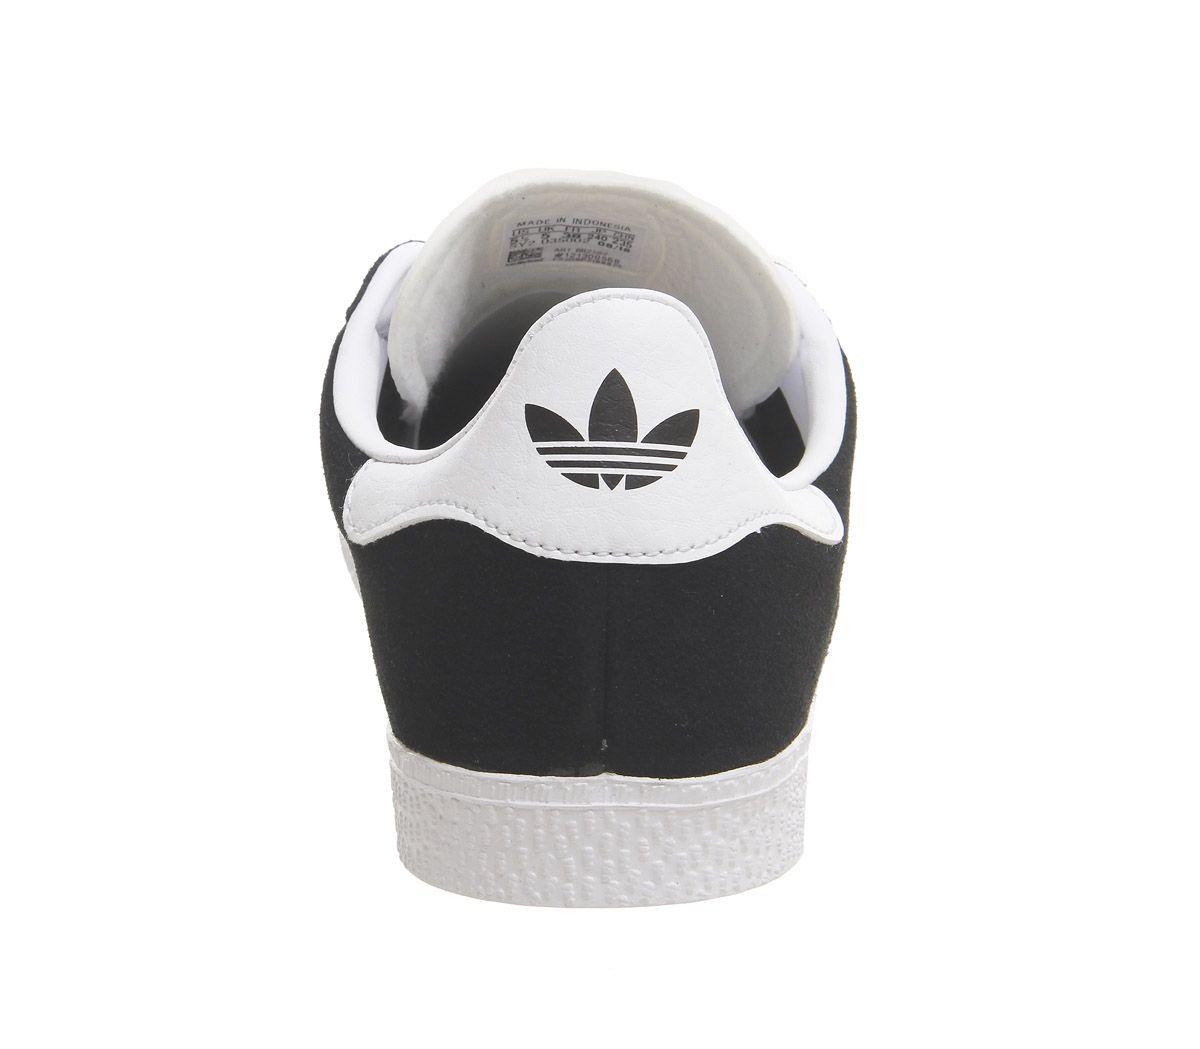 79965bb0ad65 Adidas-Femmes-Gazelle-Junior-Baskets-Coeur-Noir-Baskets miniature